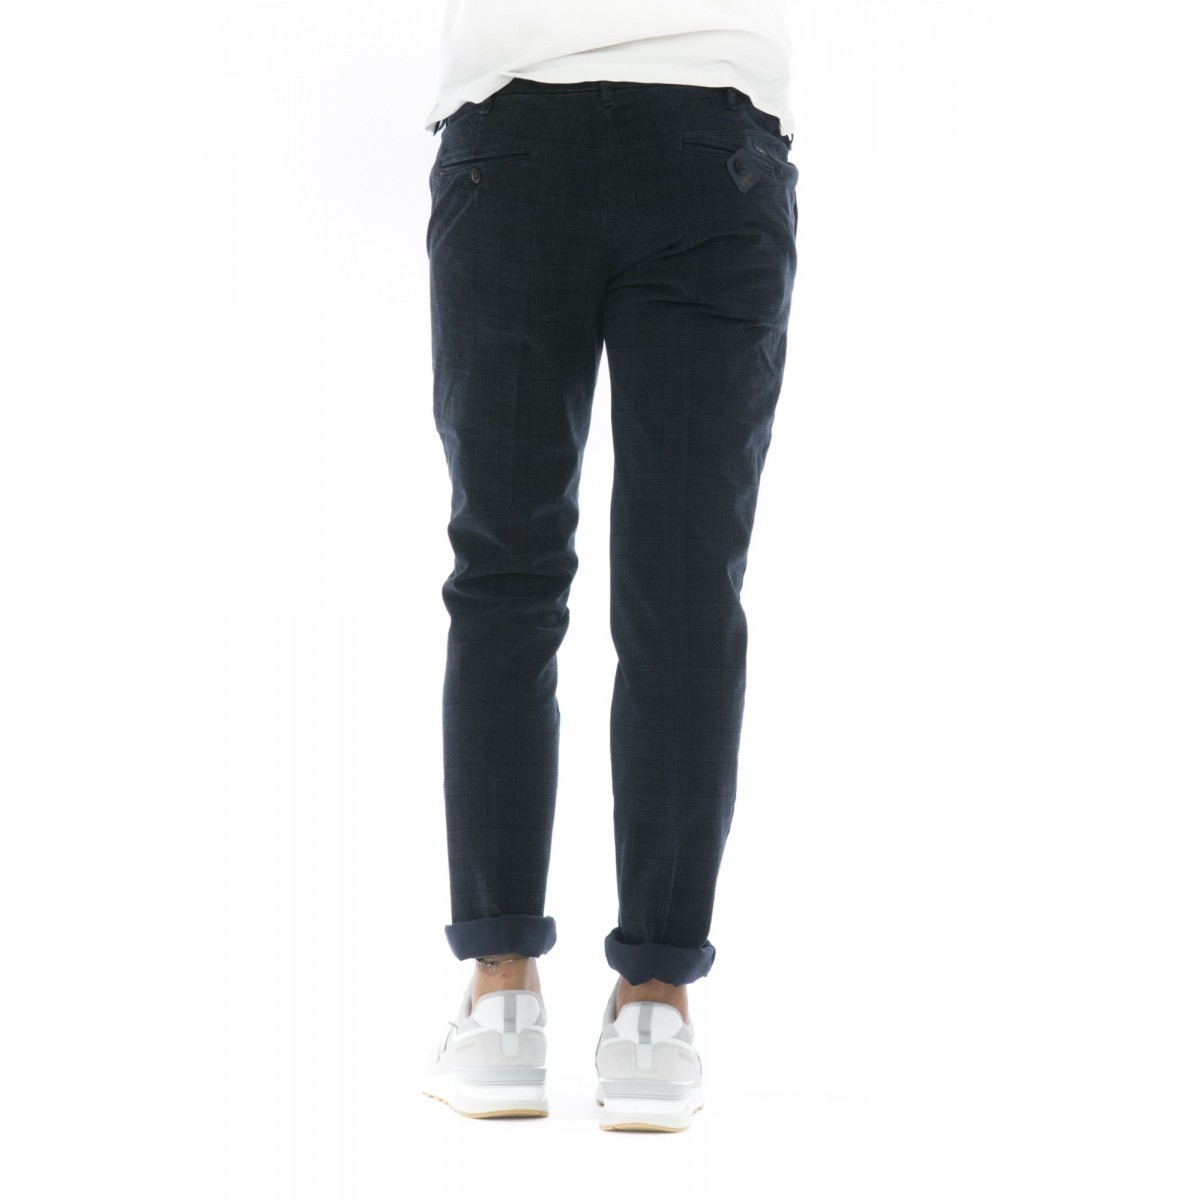 Pantaloni - Lenny 1060 gabardina stampa